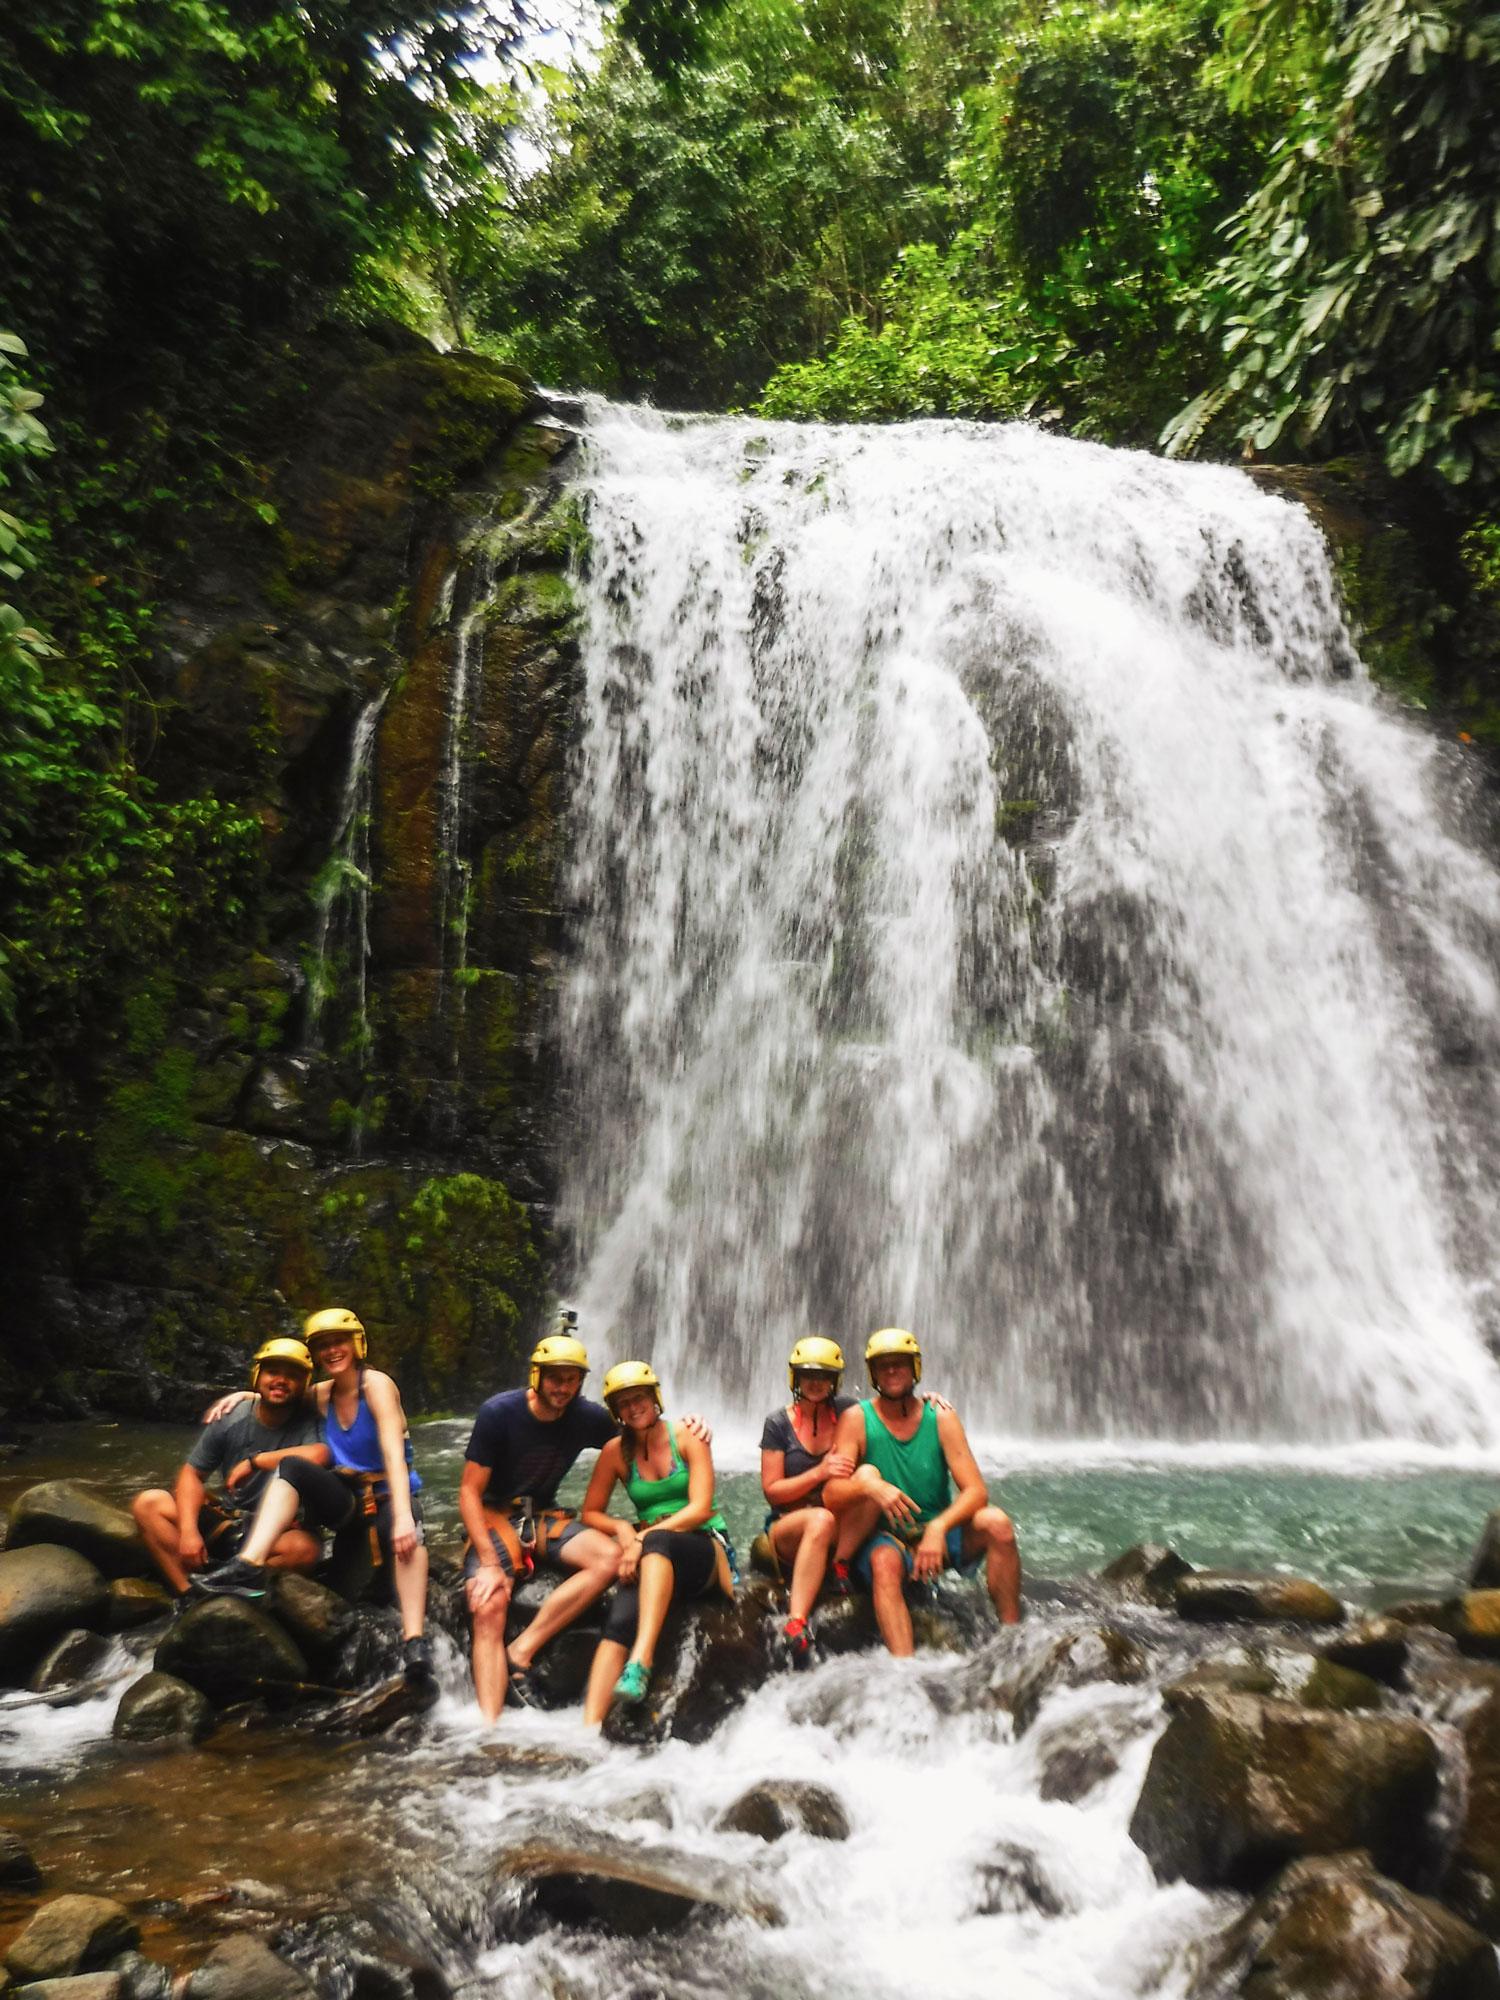 uvita-costa-rica-wander-south-rapelling-group-2.jpg